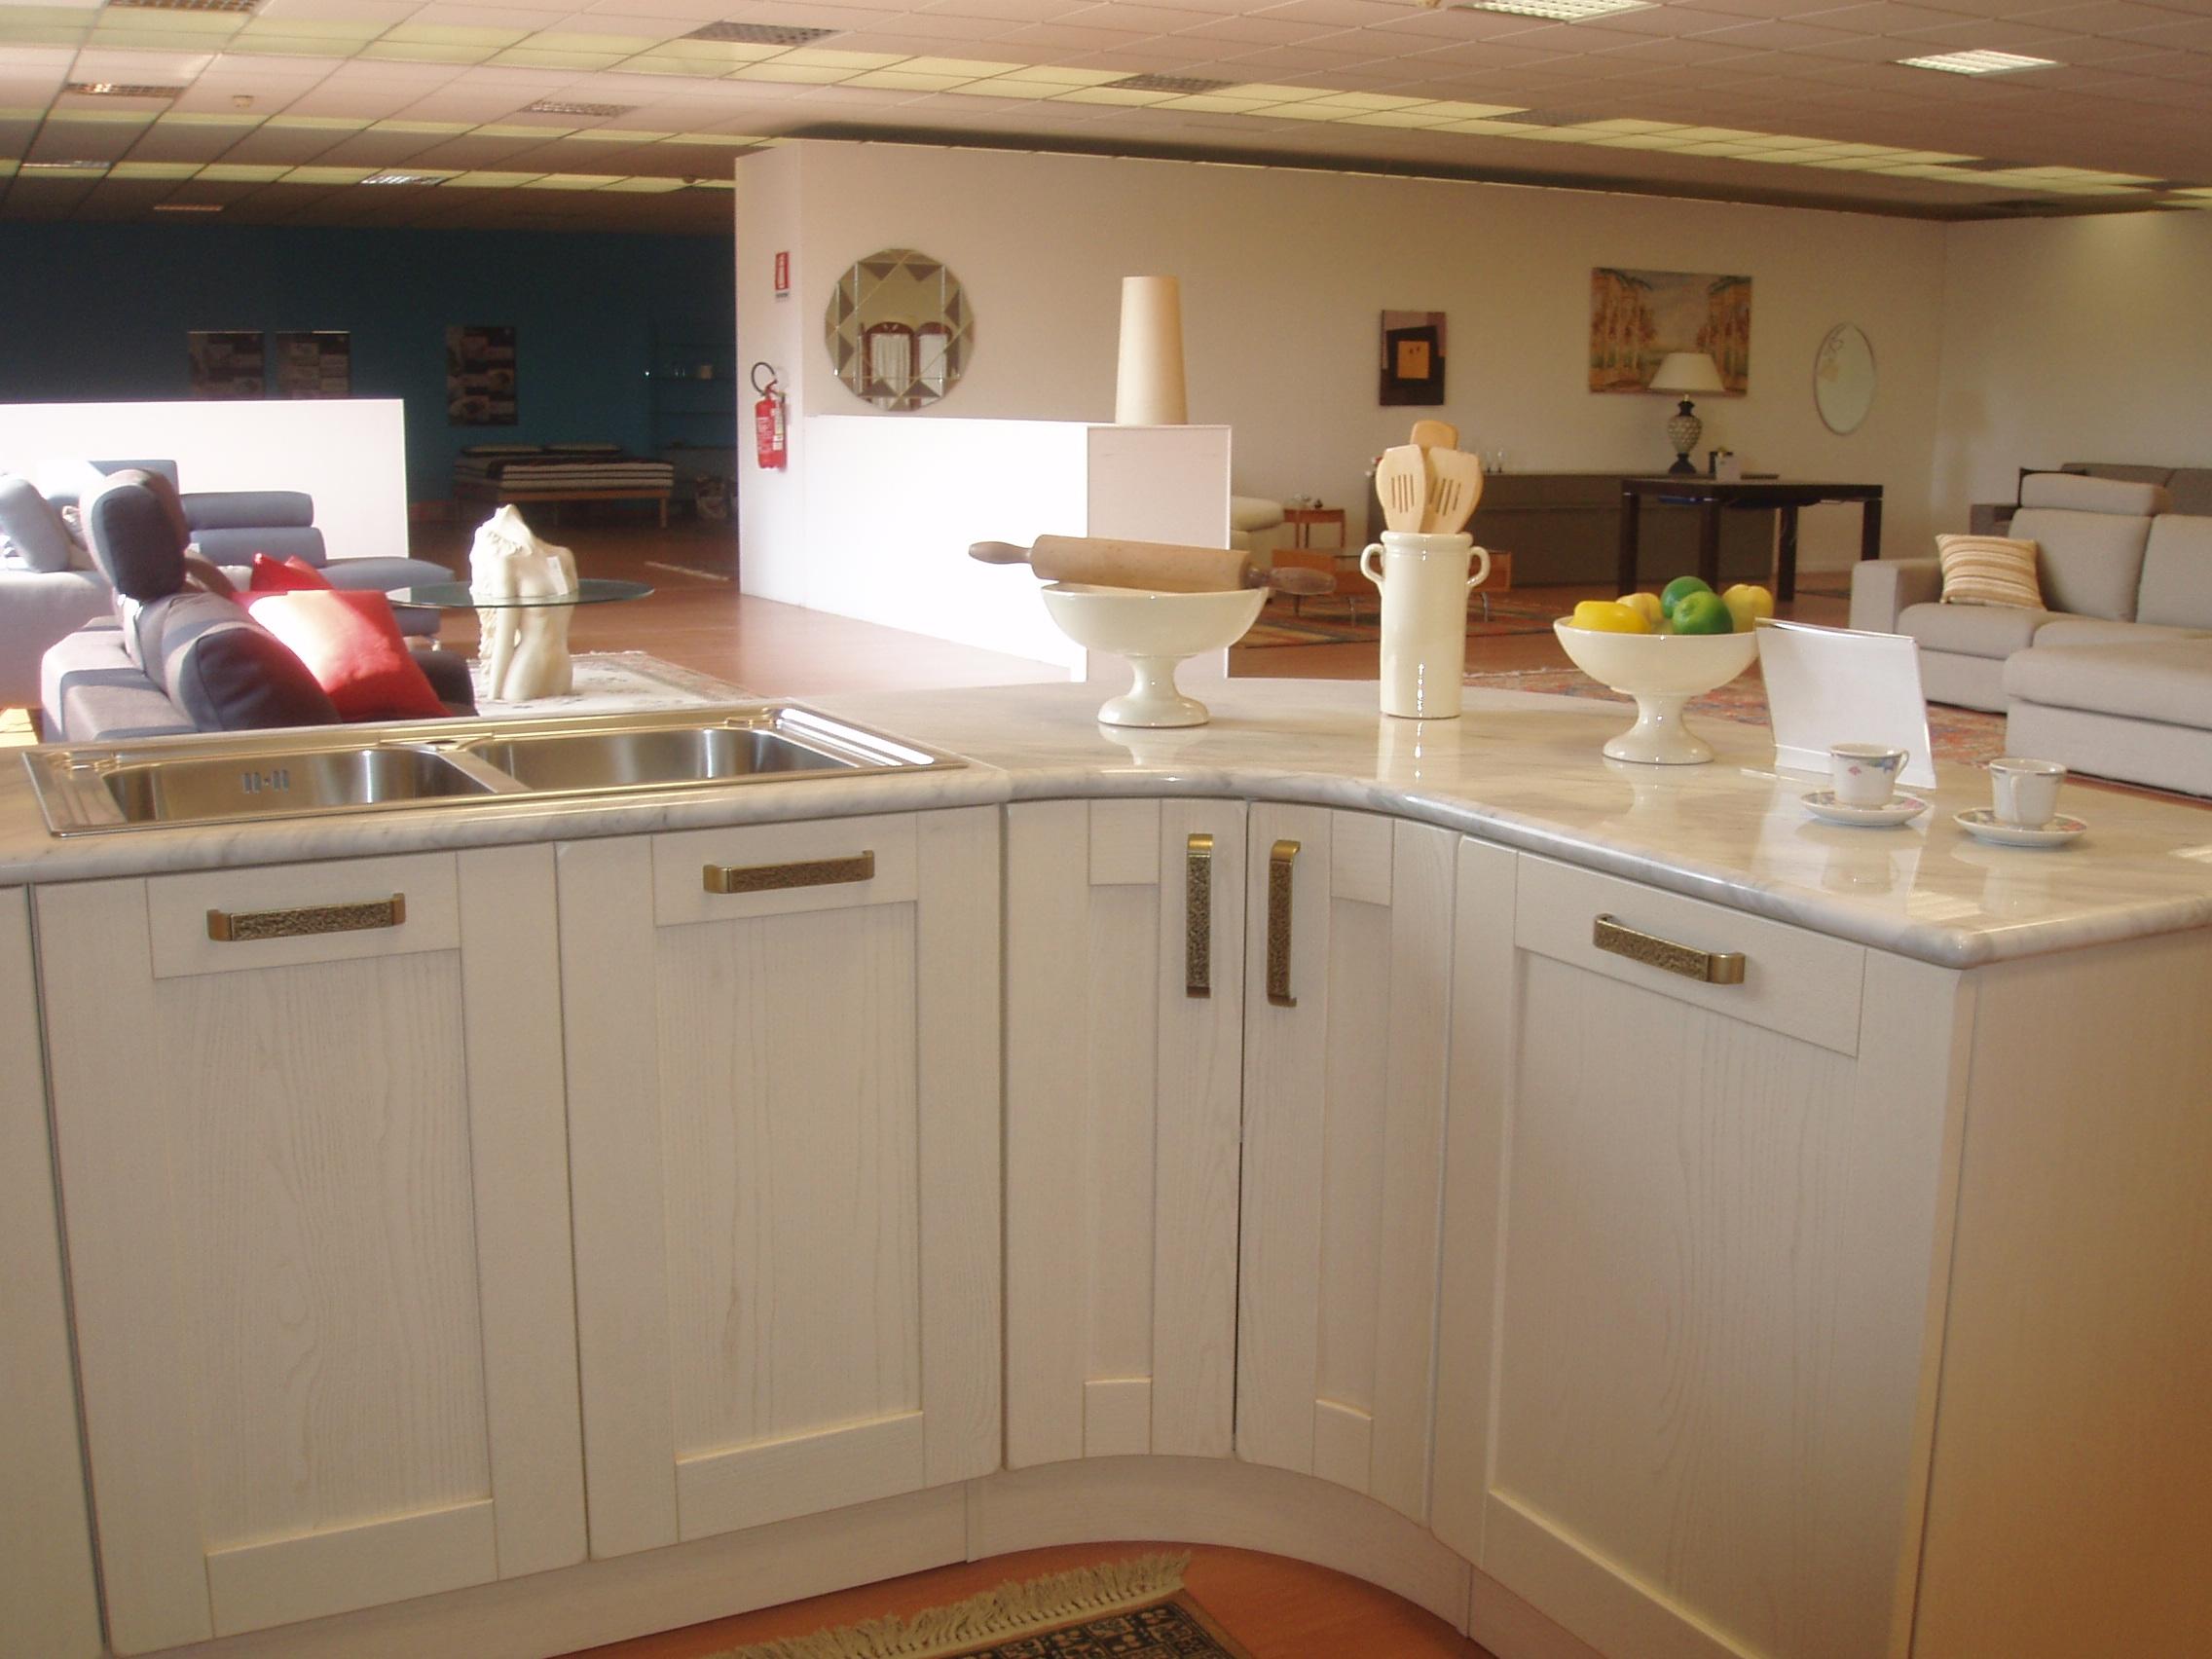 Cucina ar tre signoressa classica legno bianca cucine a prezzi scontati - Cucina bianca classica ...